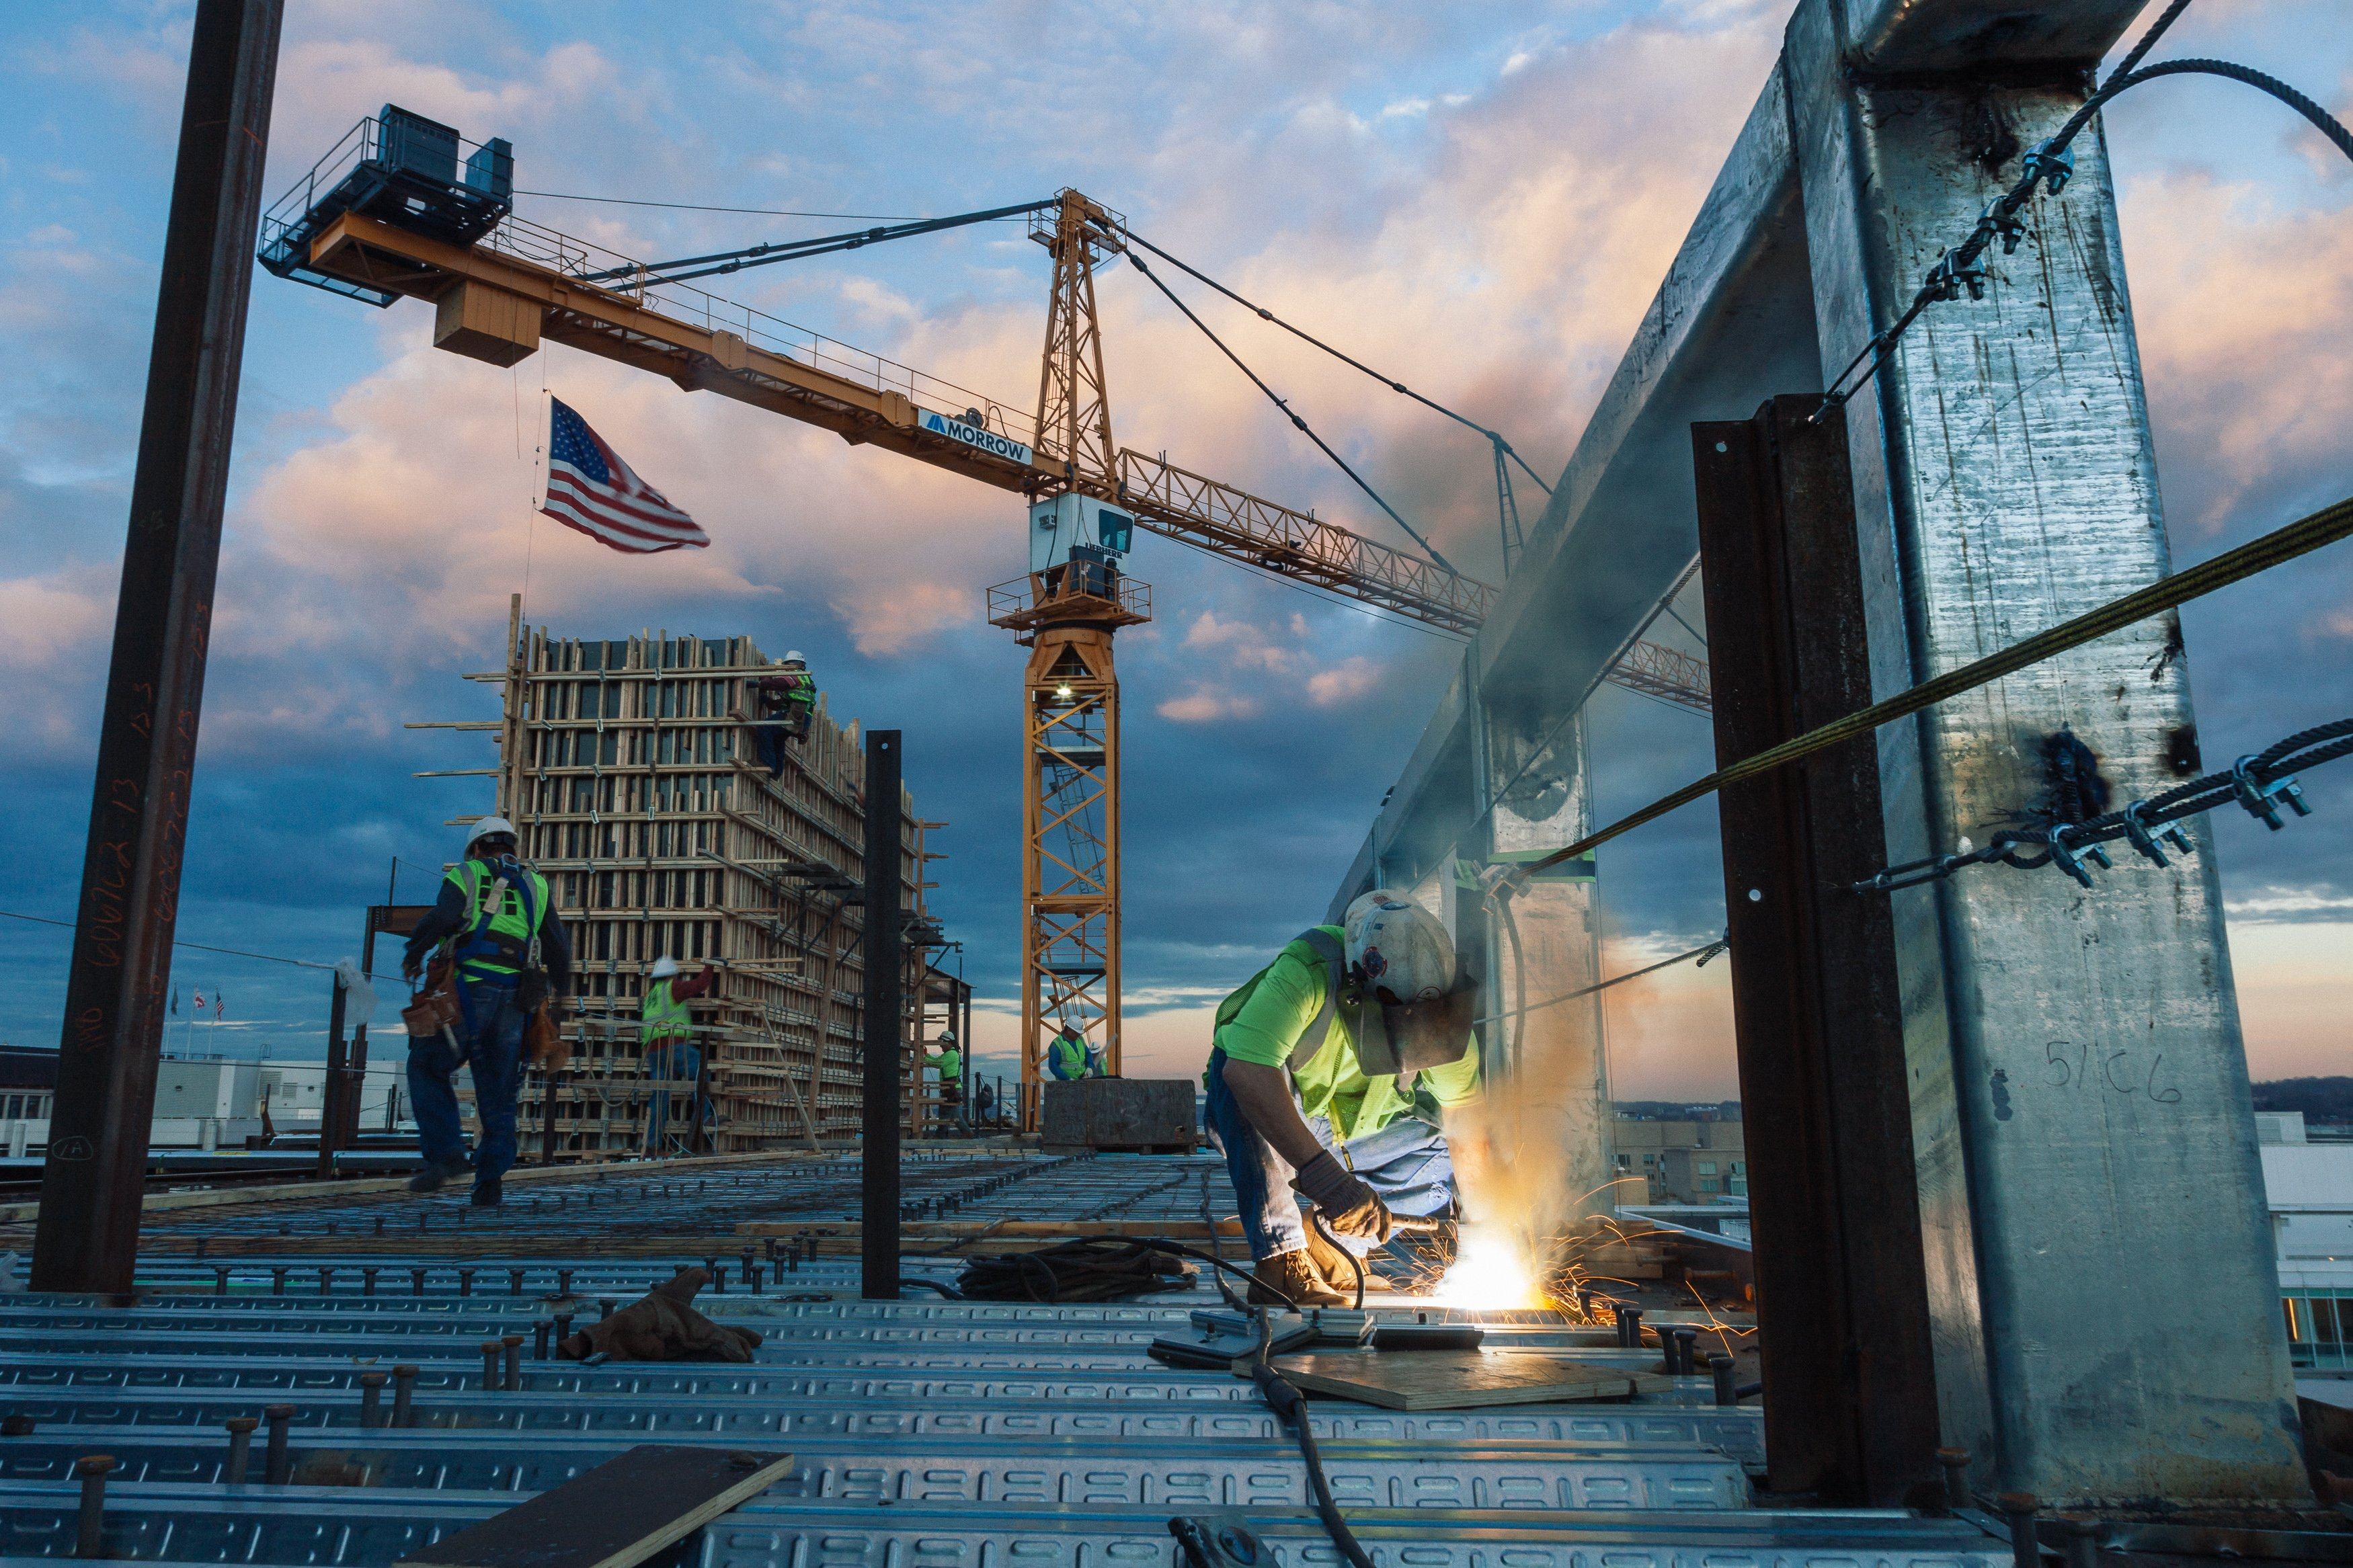 HammerTech Lite in Action at DAVIS Construction